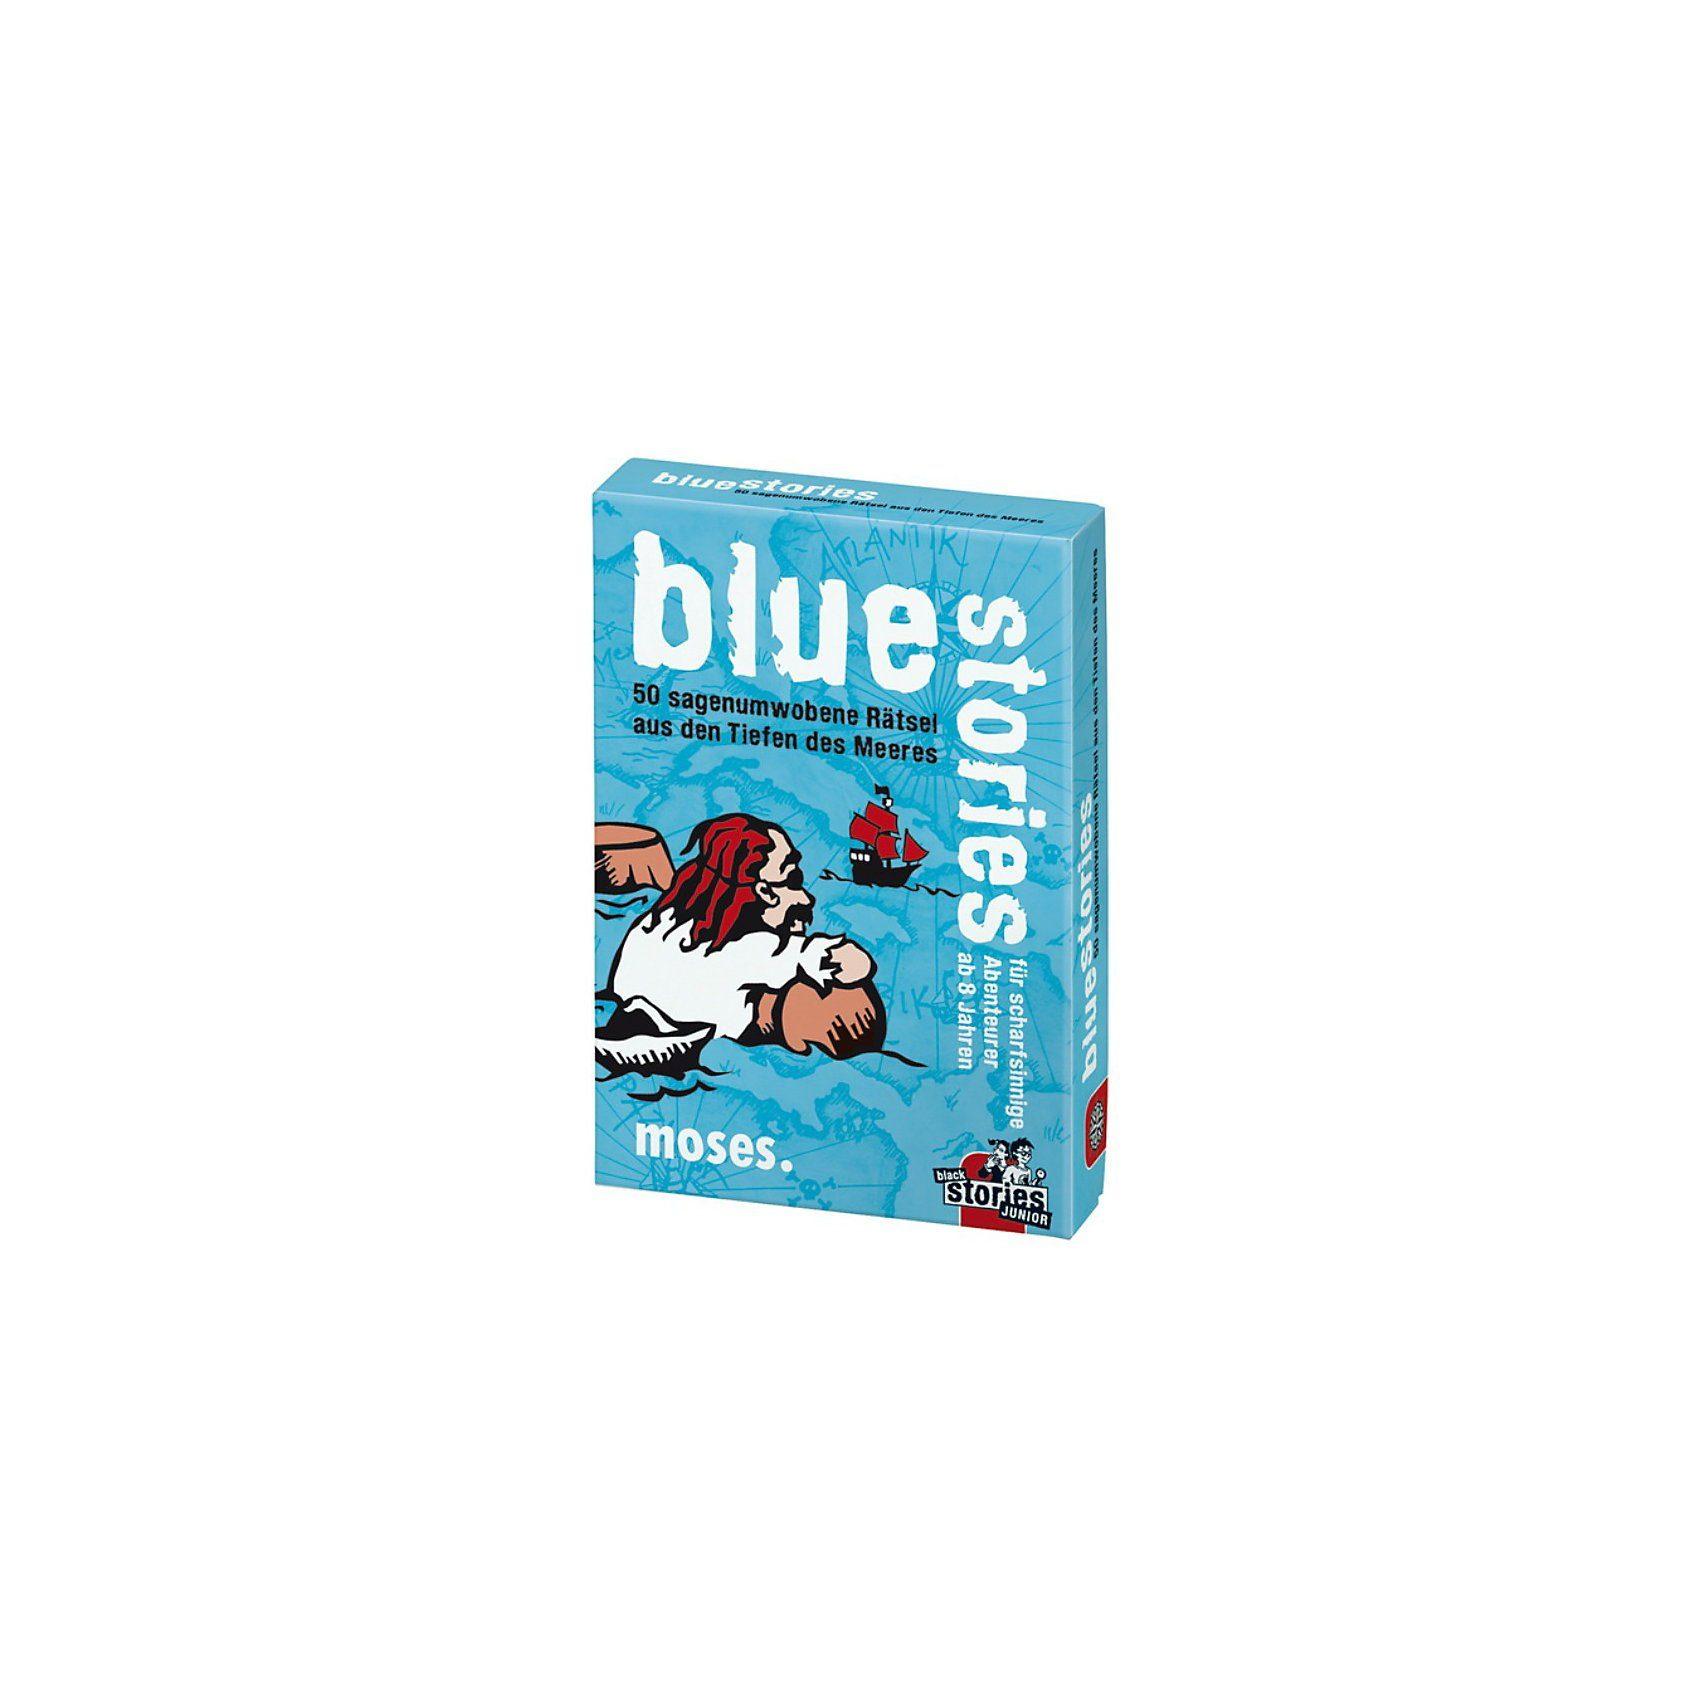 moses Blue Stories - 50 sagenumwobene Rätsel aus den Tiefen des Me